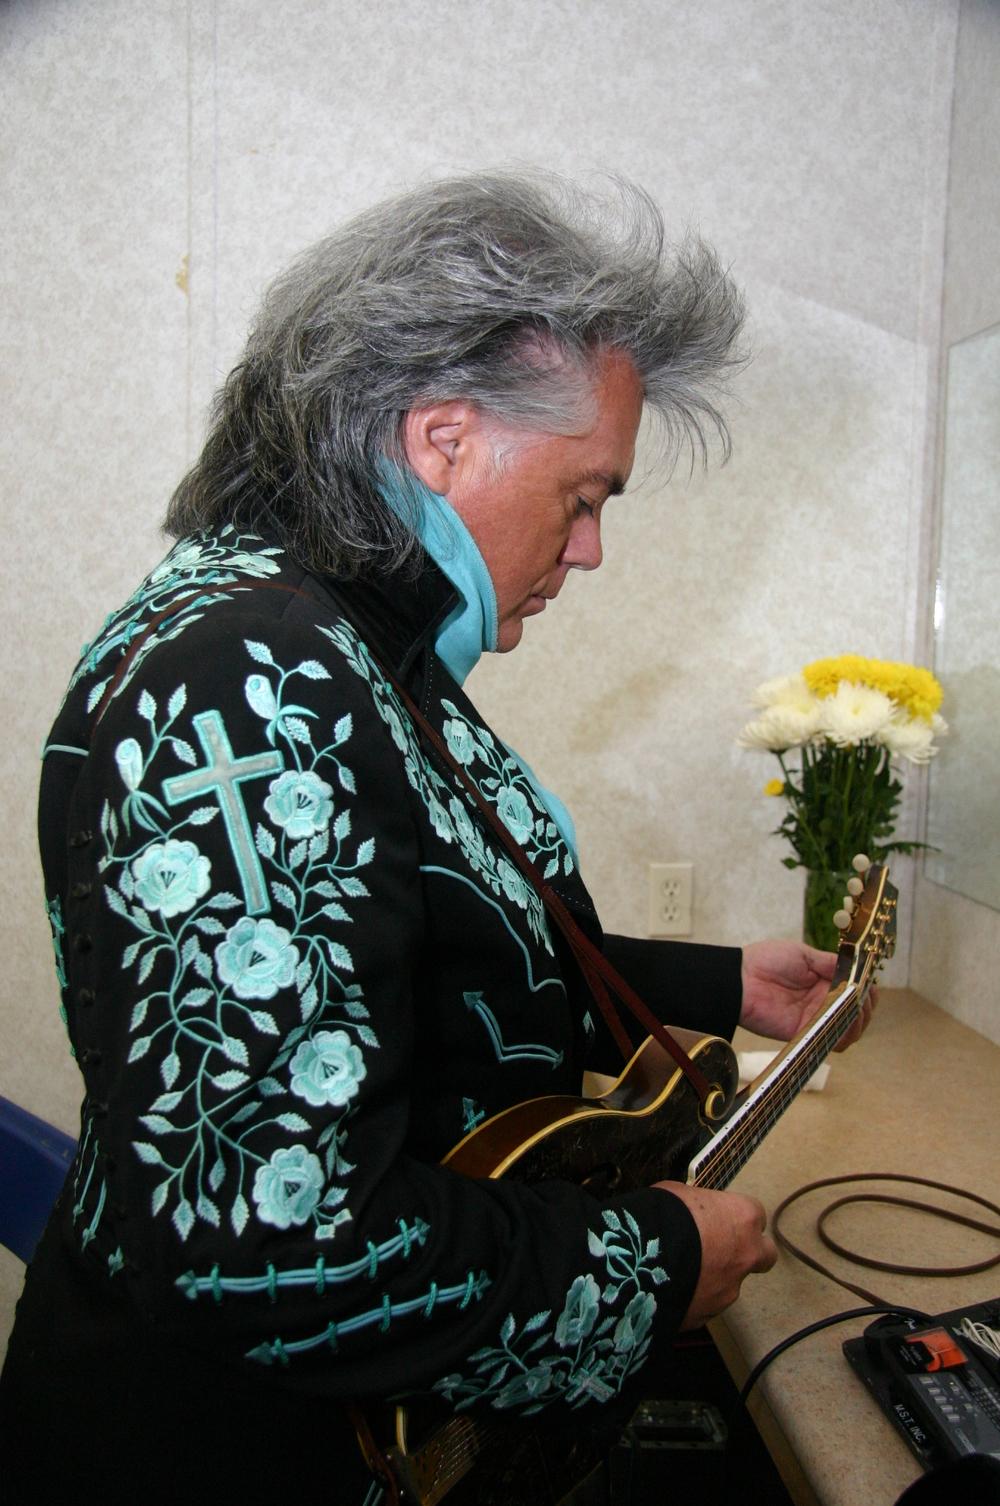 2011 - Marty Stuart